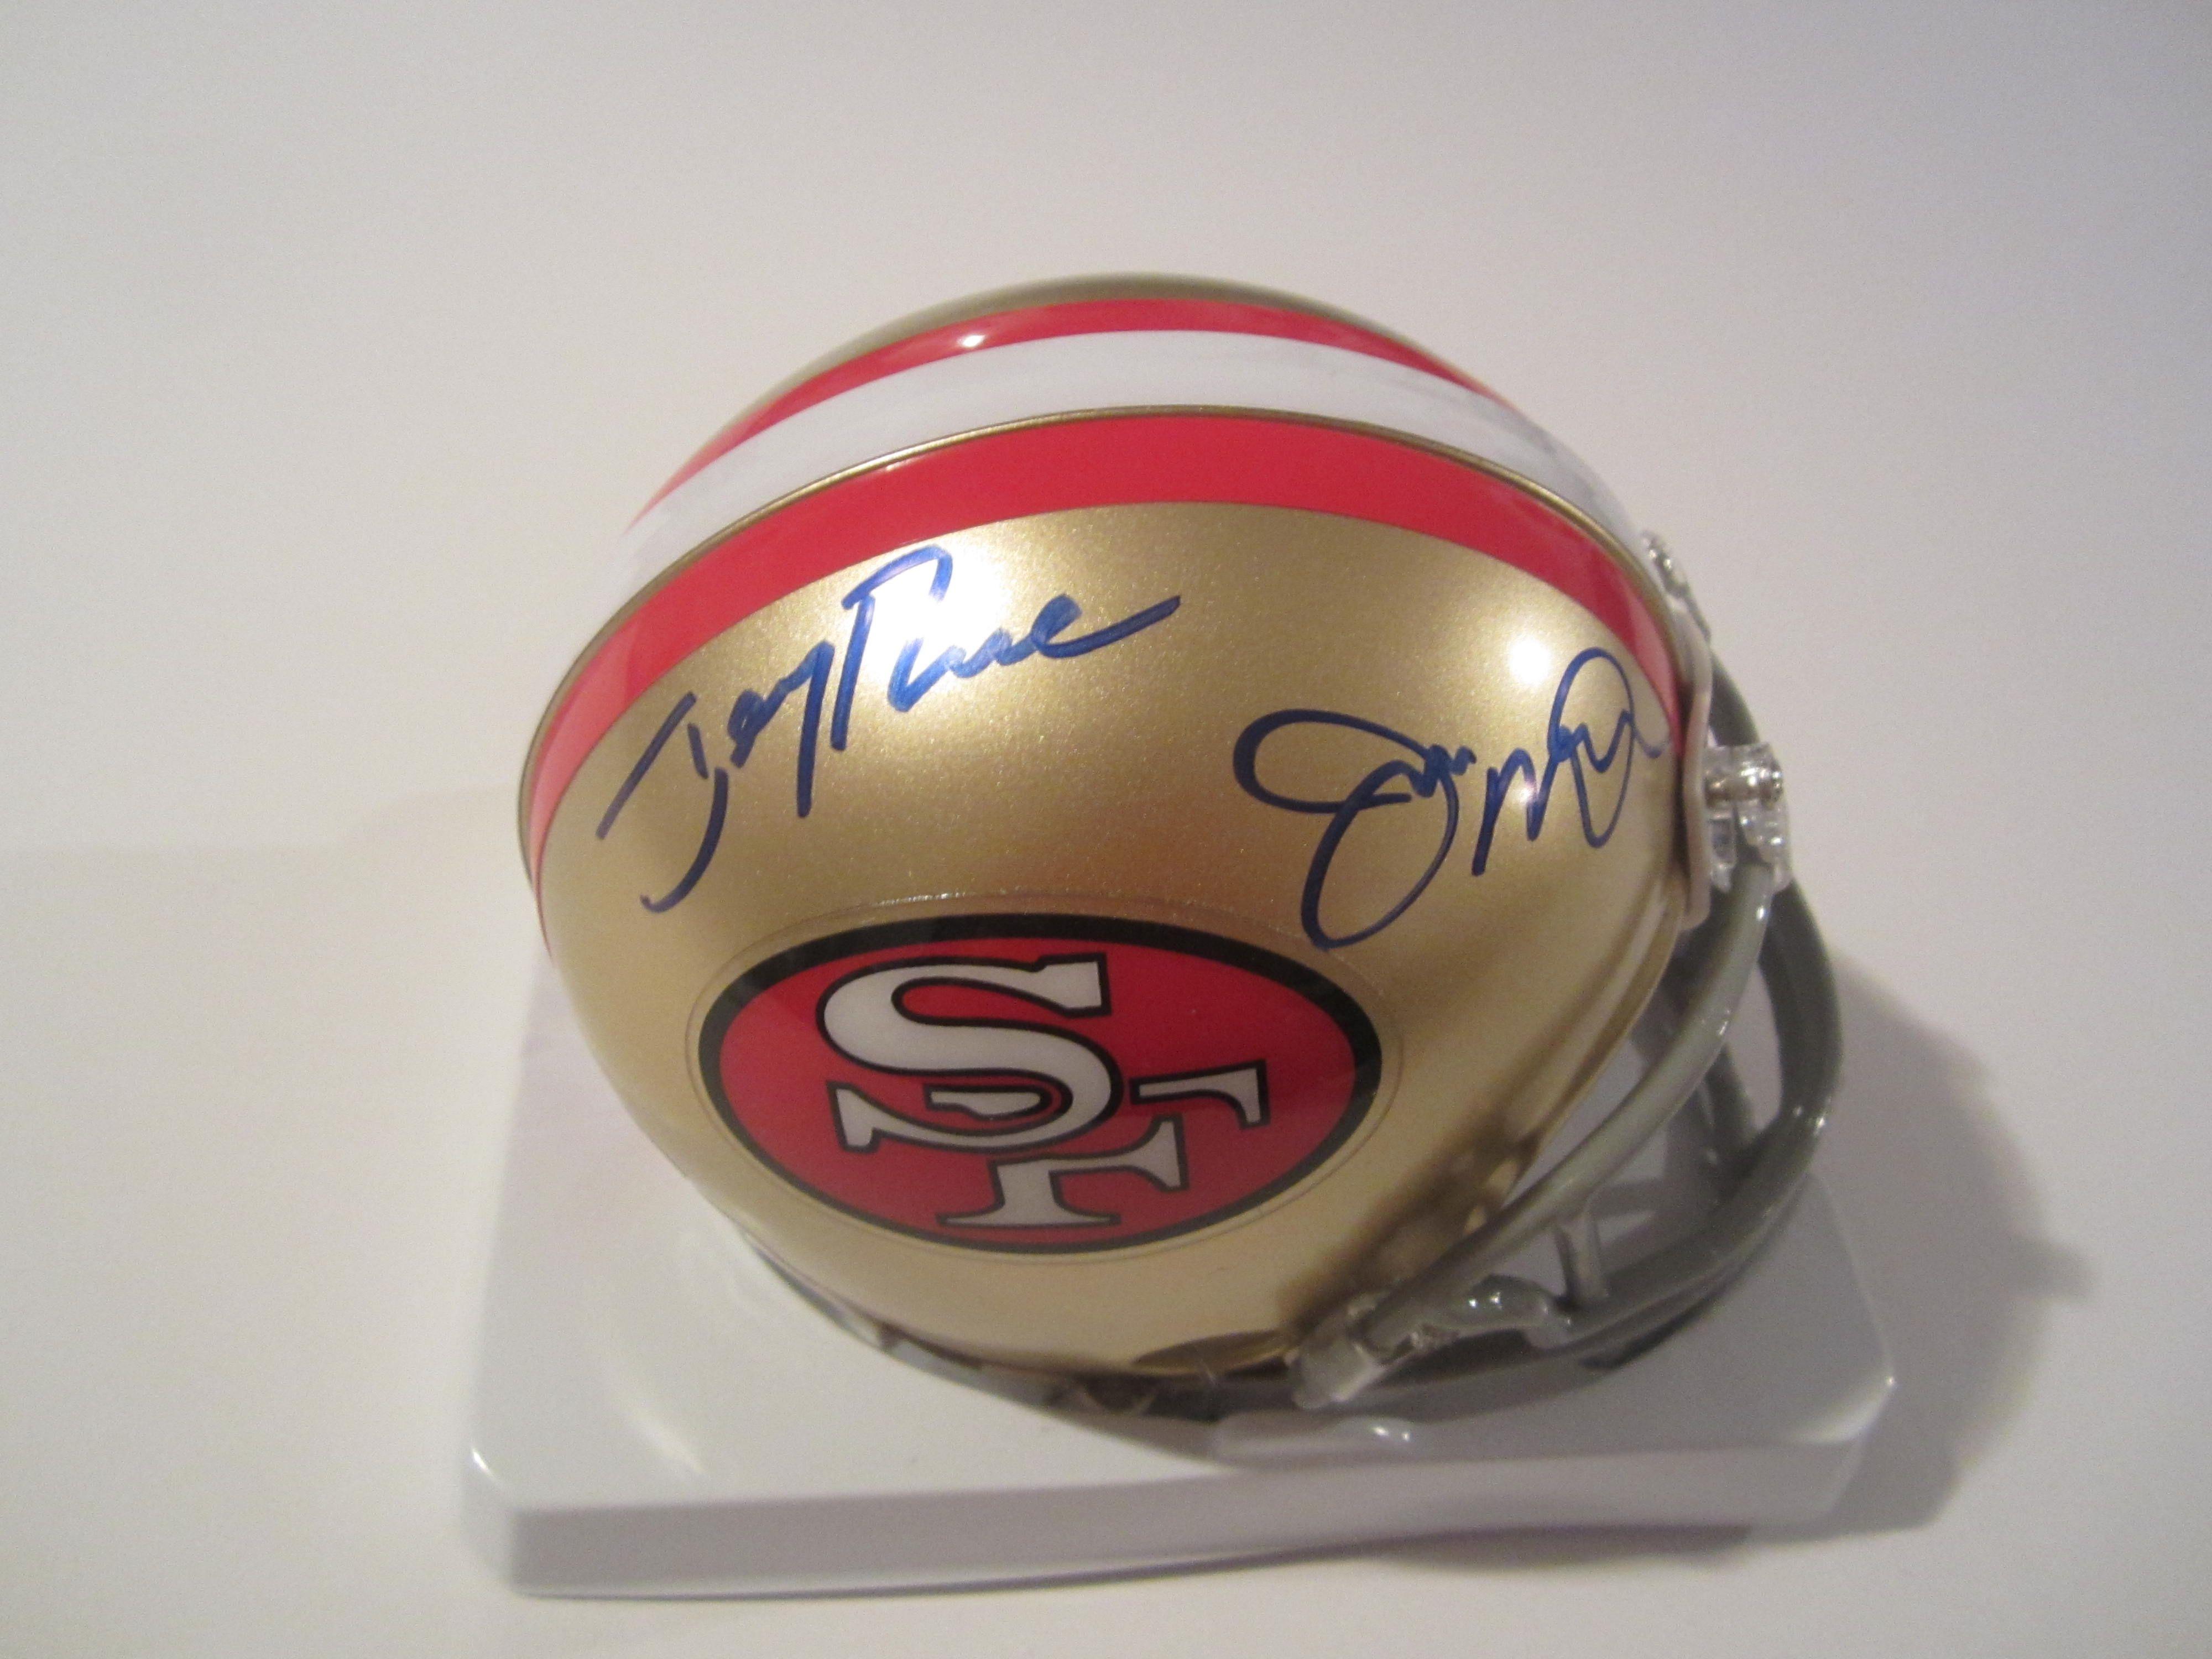 c9e75f54111 Jerry Rice   Joe Montana Signed San Francisco 49ers Mini Helmet ...